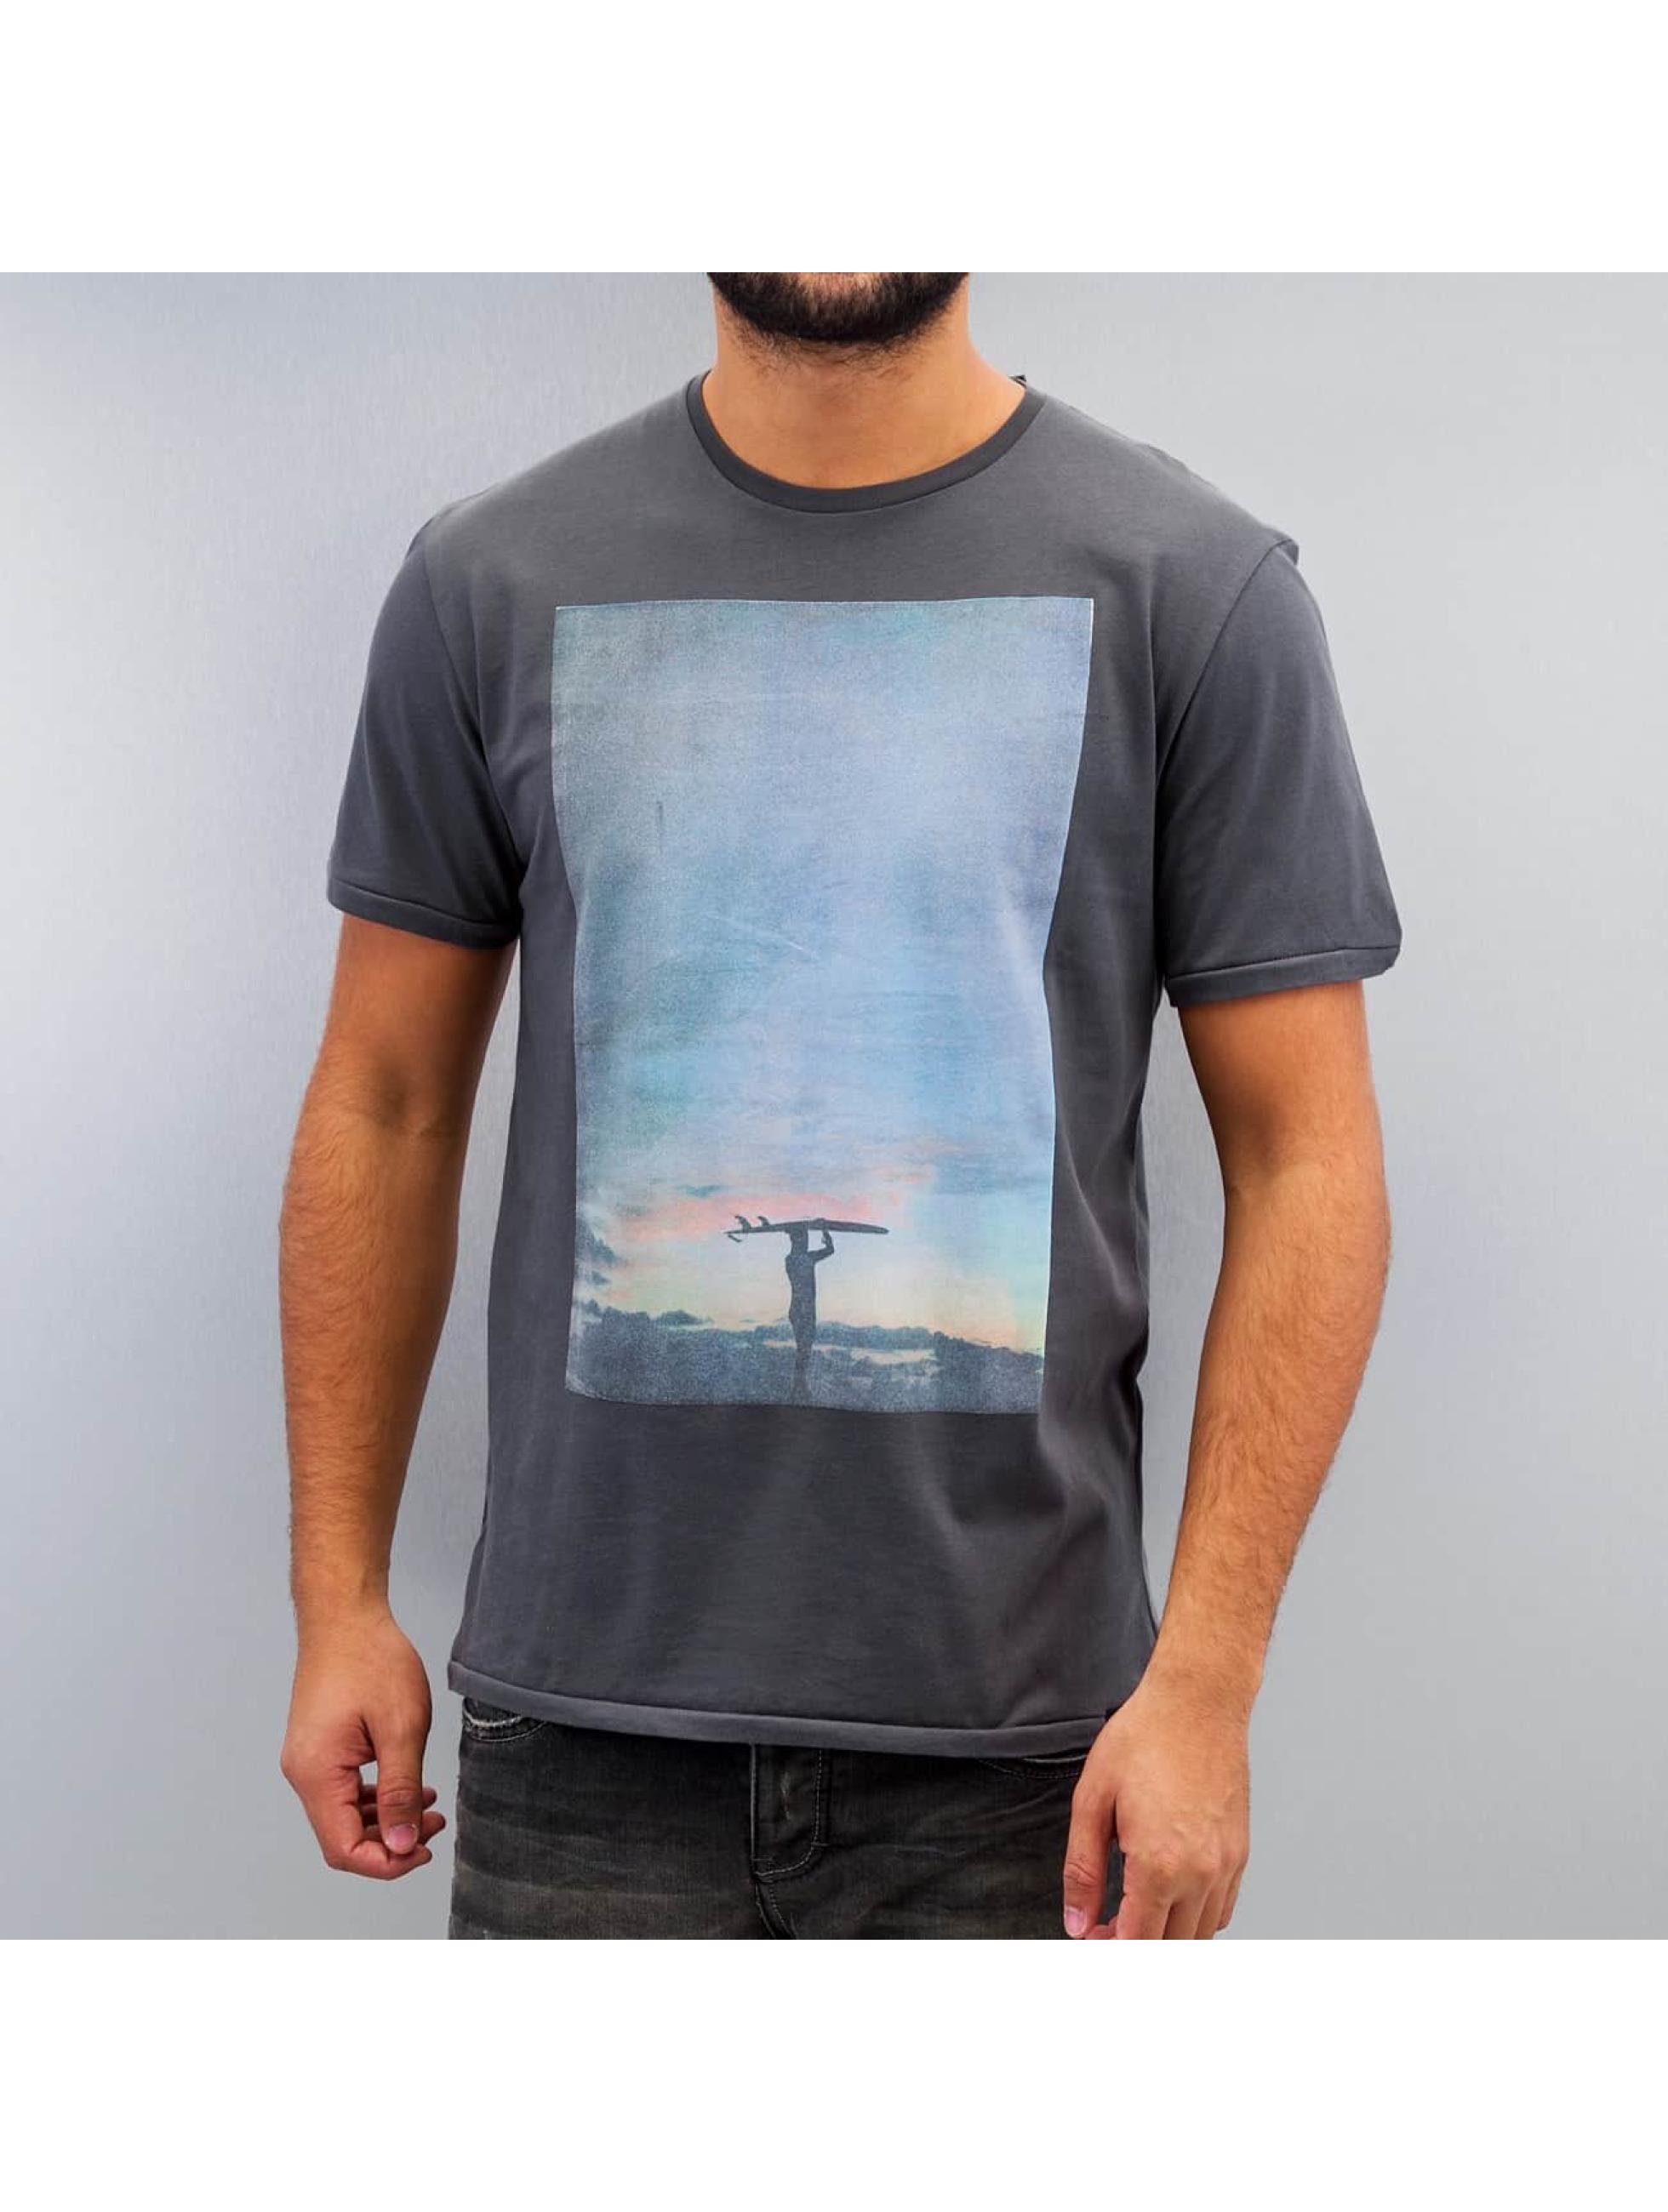 O'NEILL T-Shirt Mul grey